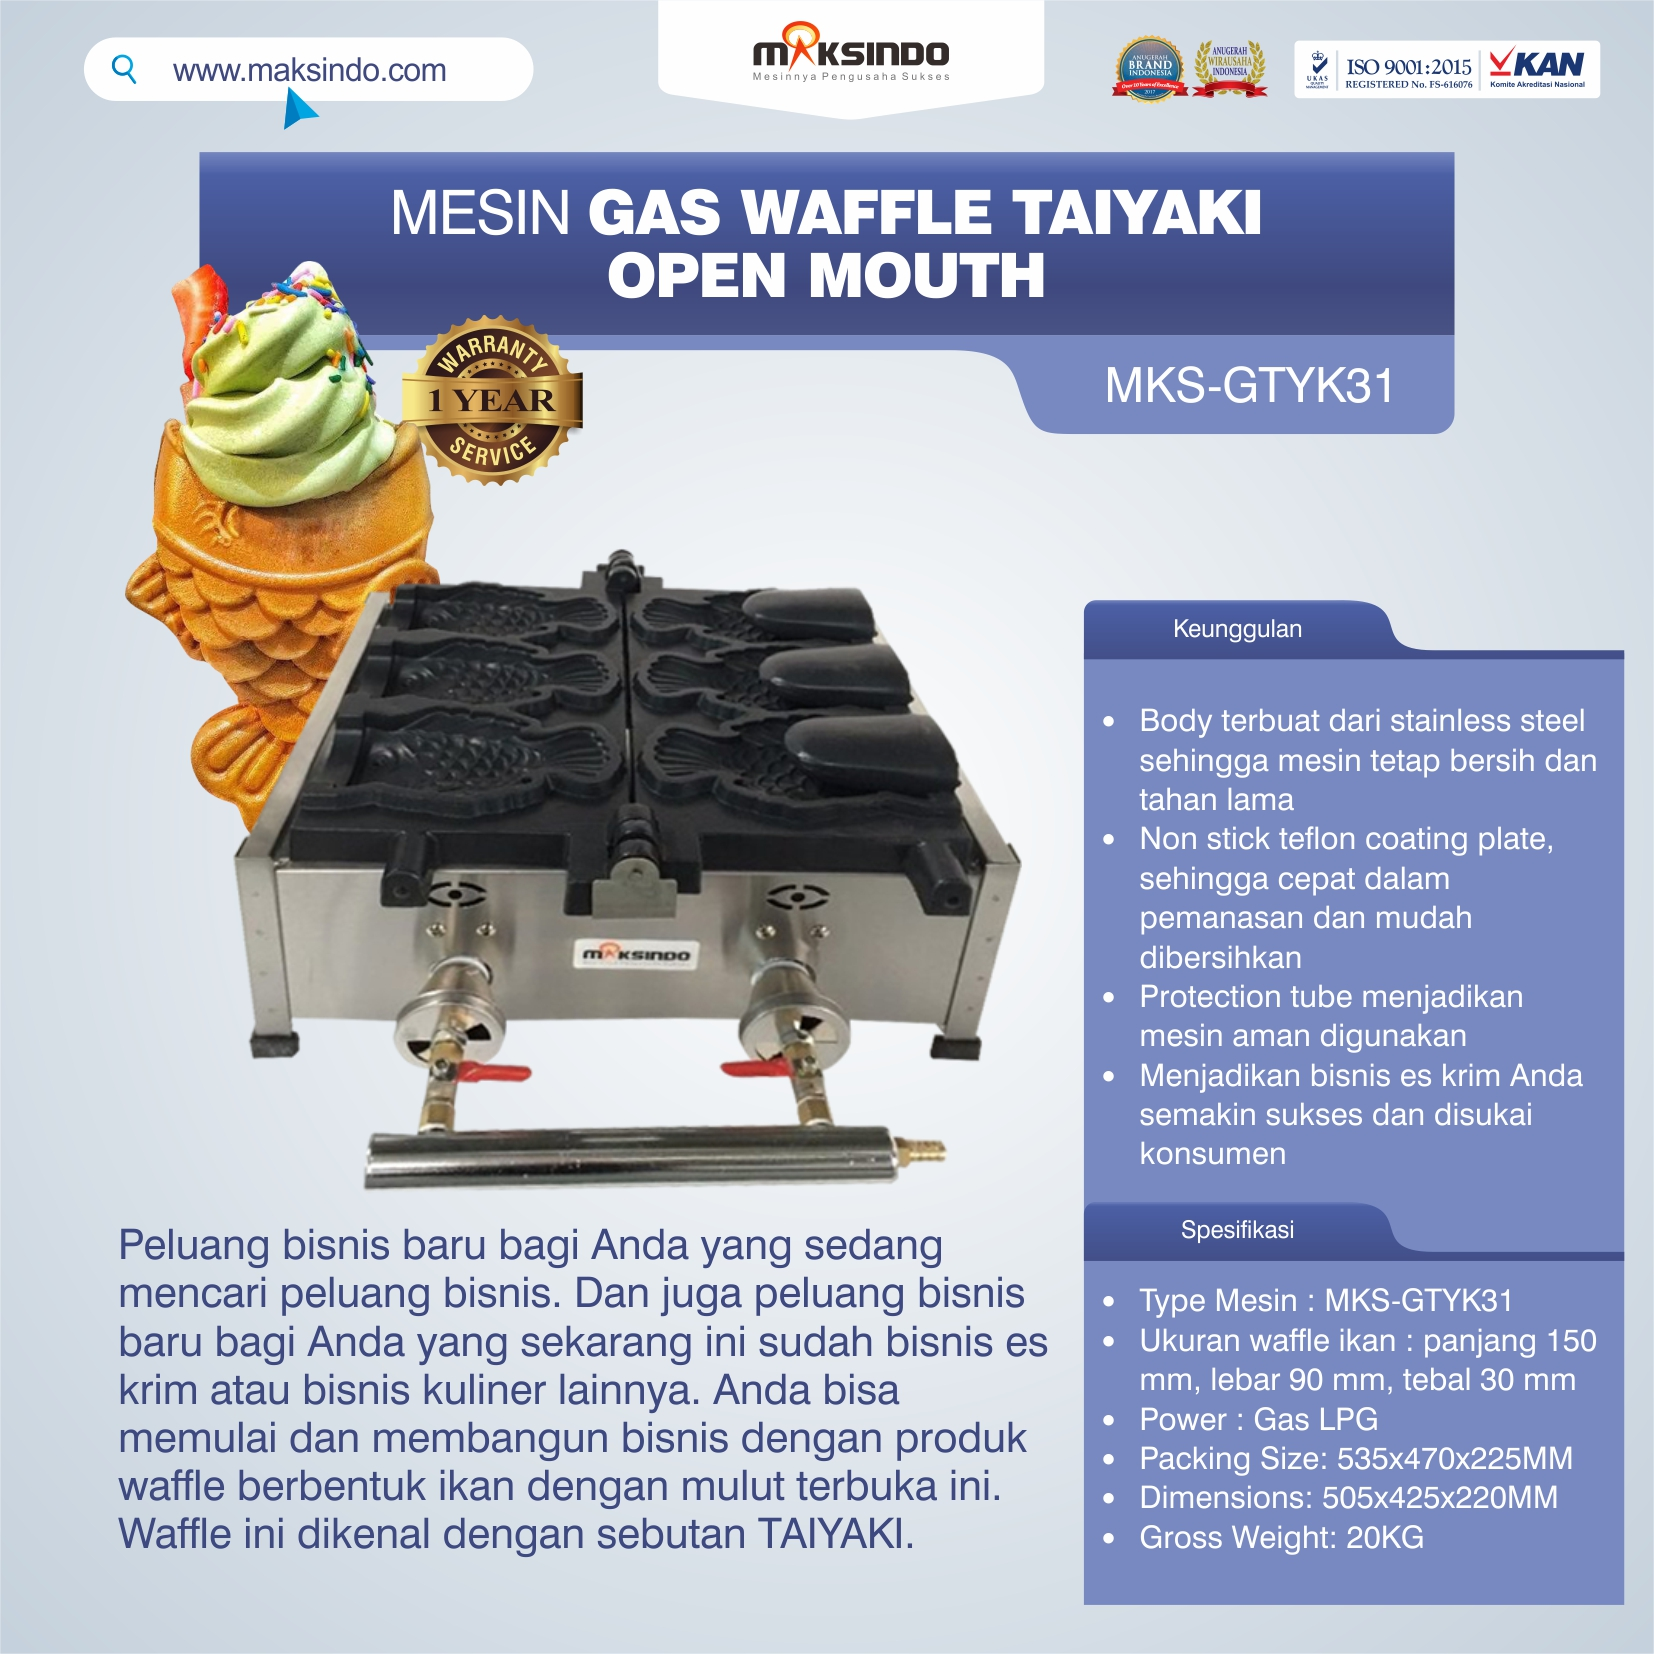 Jual Mesin Gas Waffle Taiyaki Open Mouth (GTYK31) di Bekasi